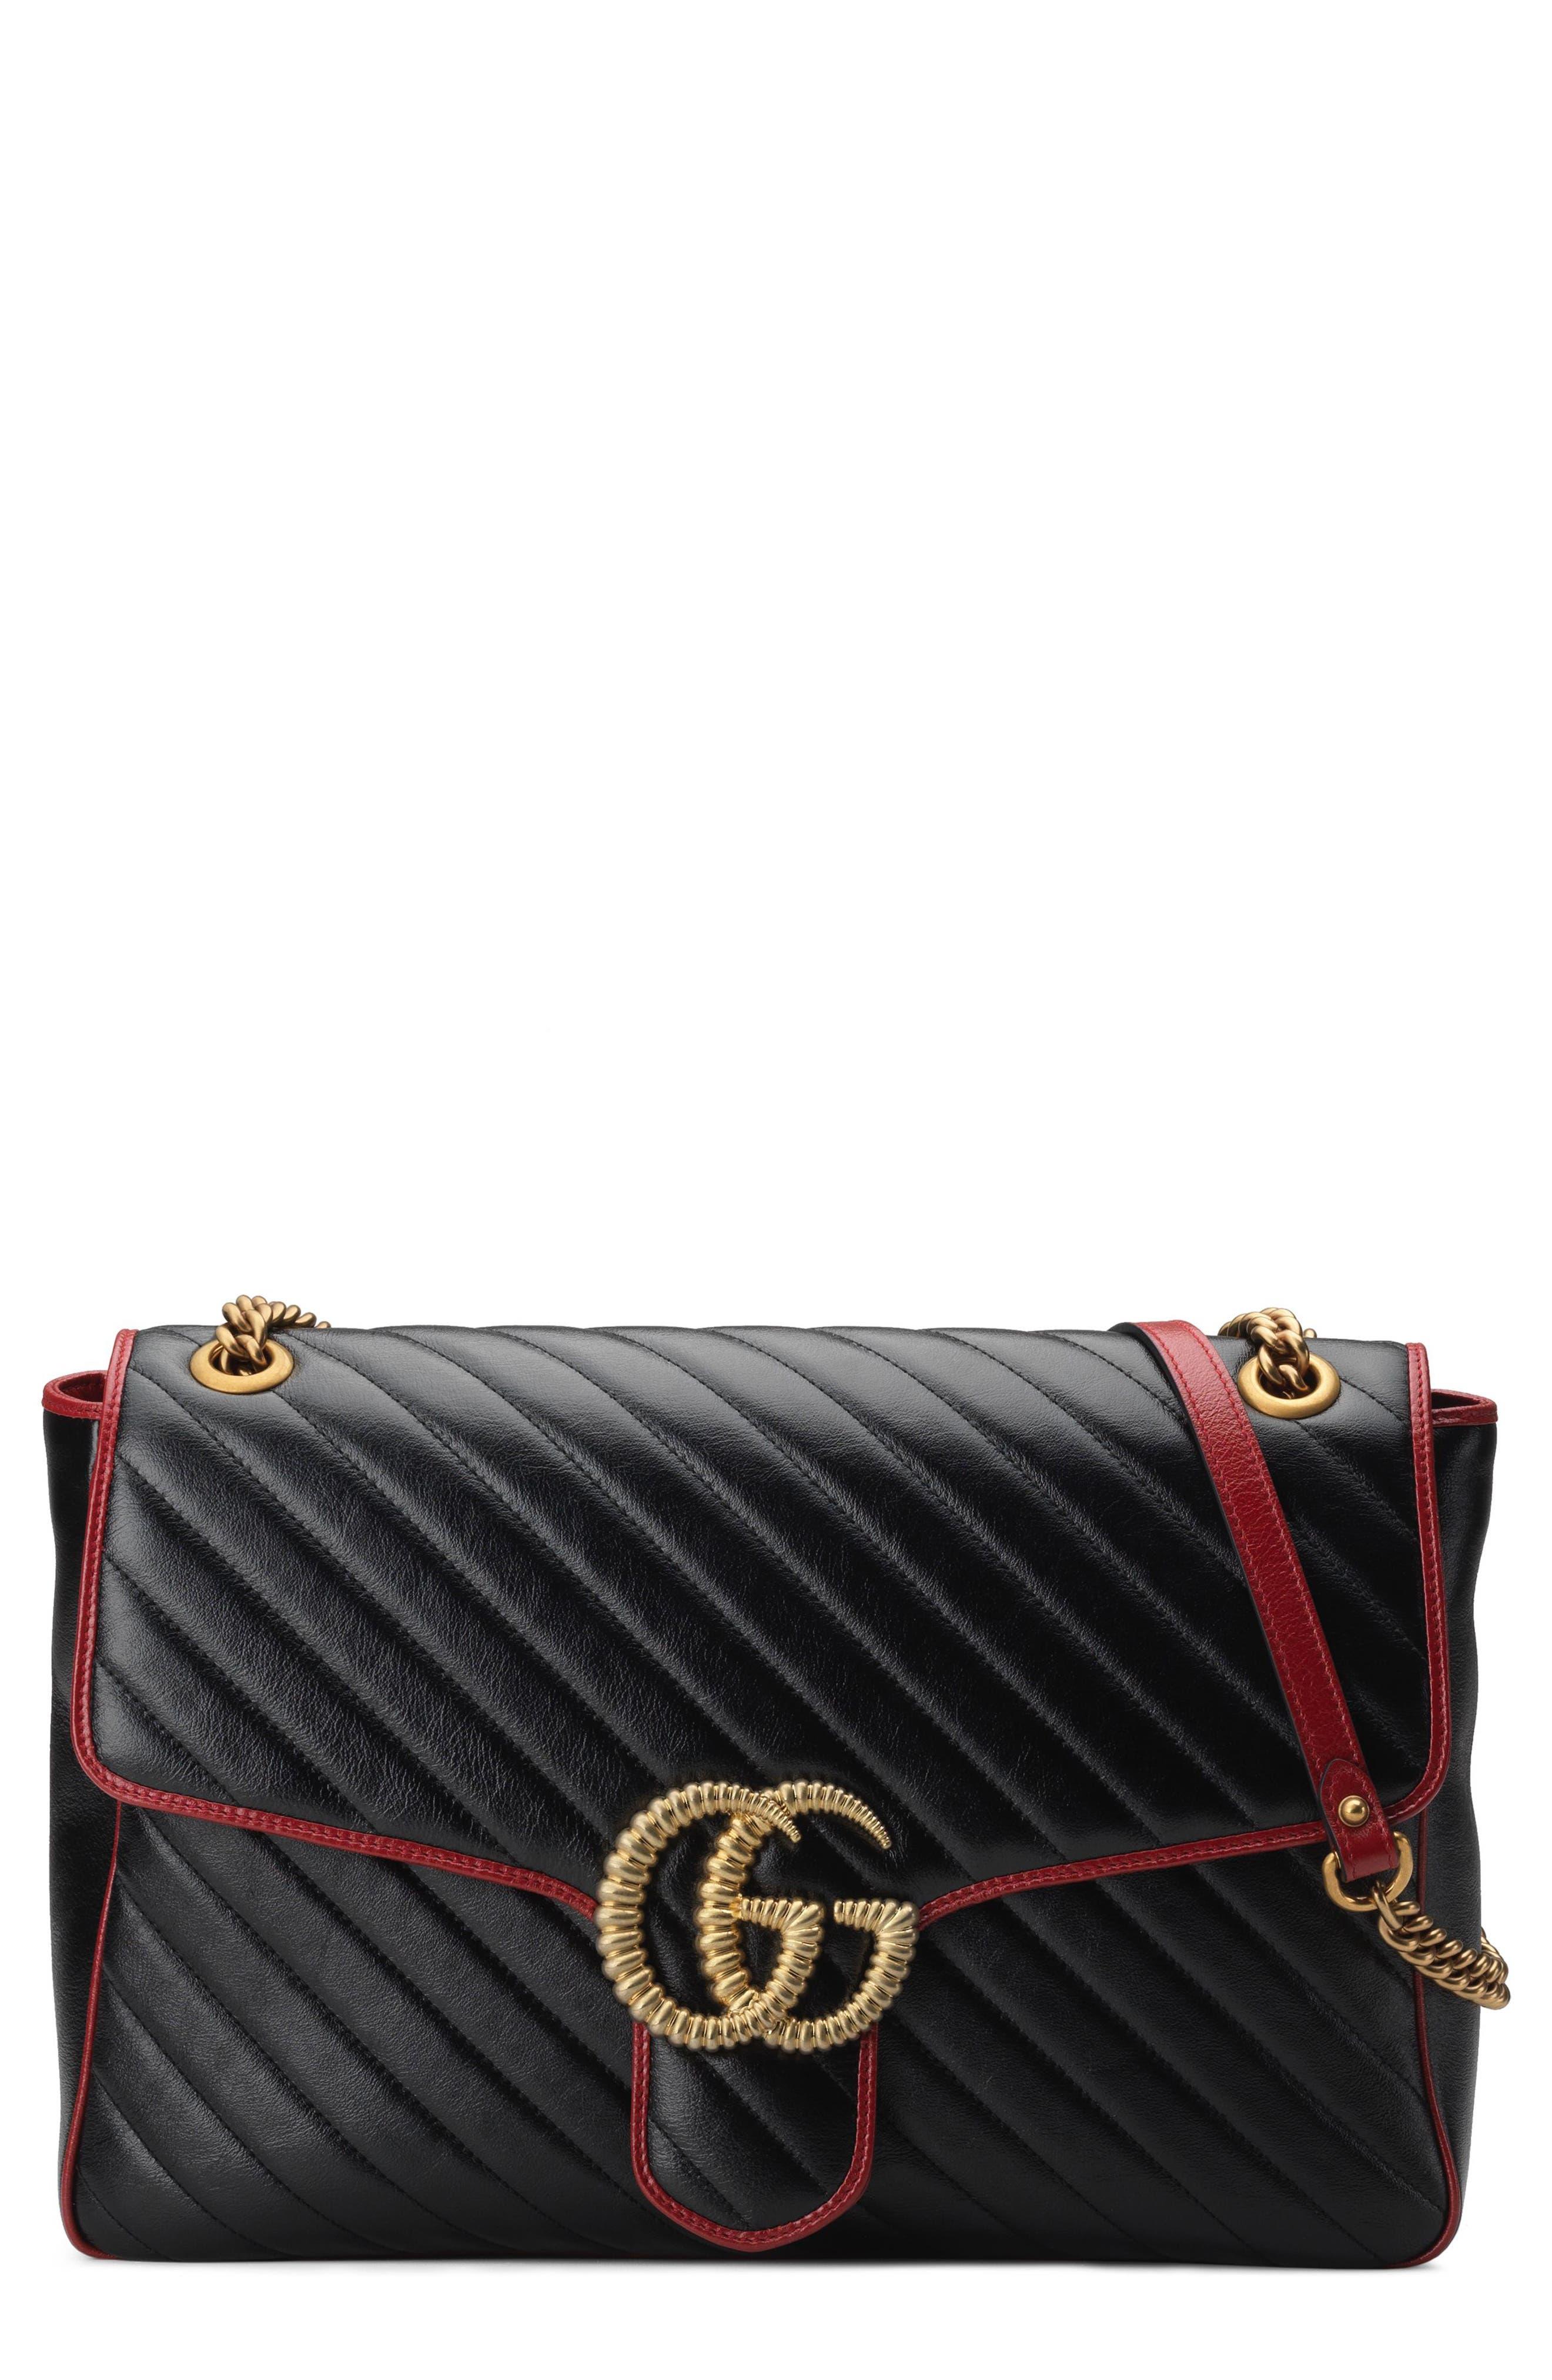 ab1cee661 Gucci Large Gg Marmont 2.0 Matelasse Leather Shoulder Bag - Black